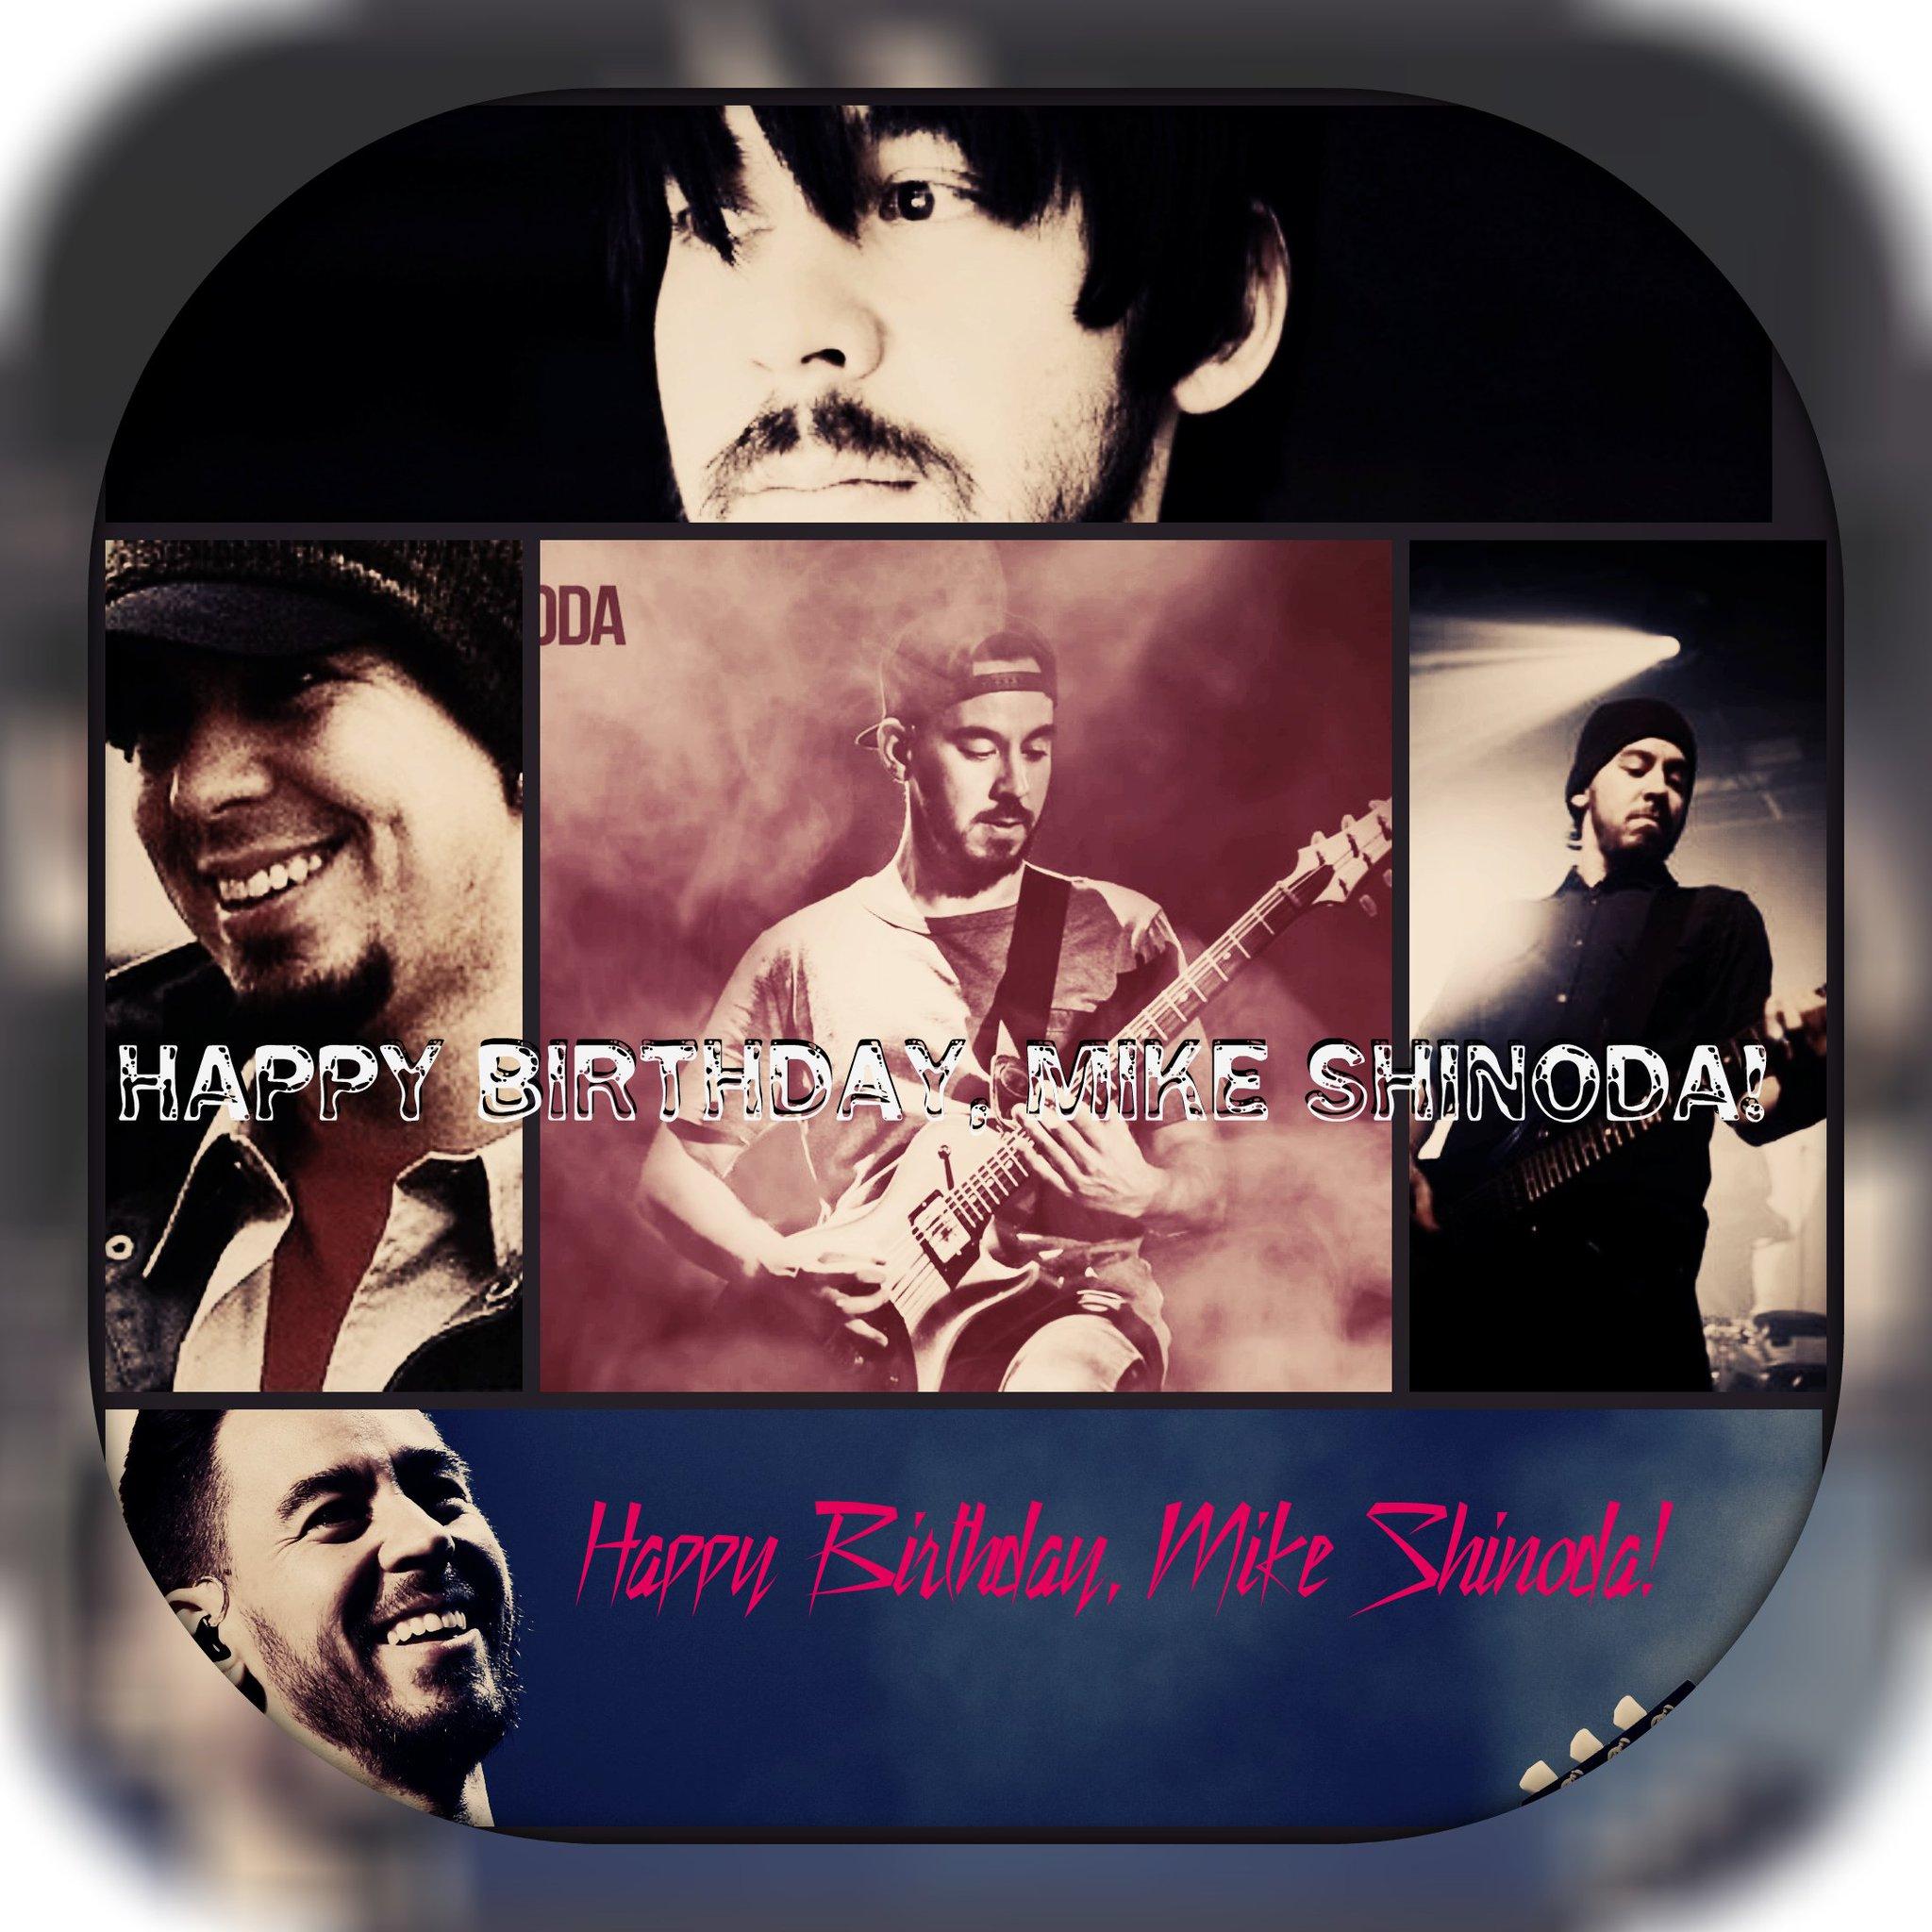 Happy Birthday Mike Shinoda!!